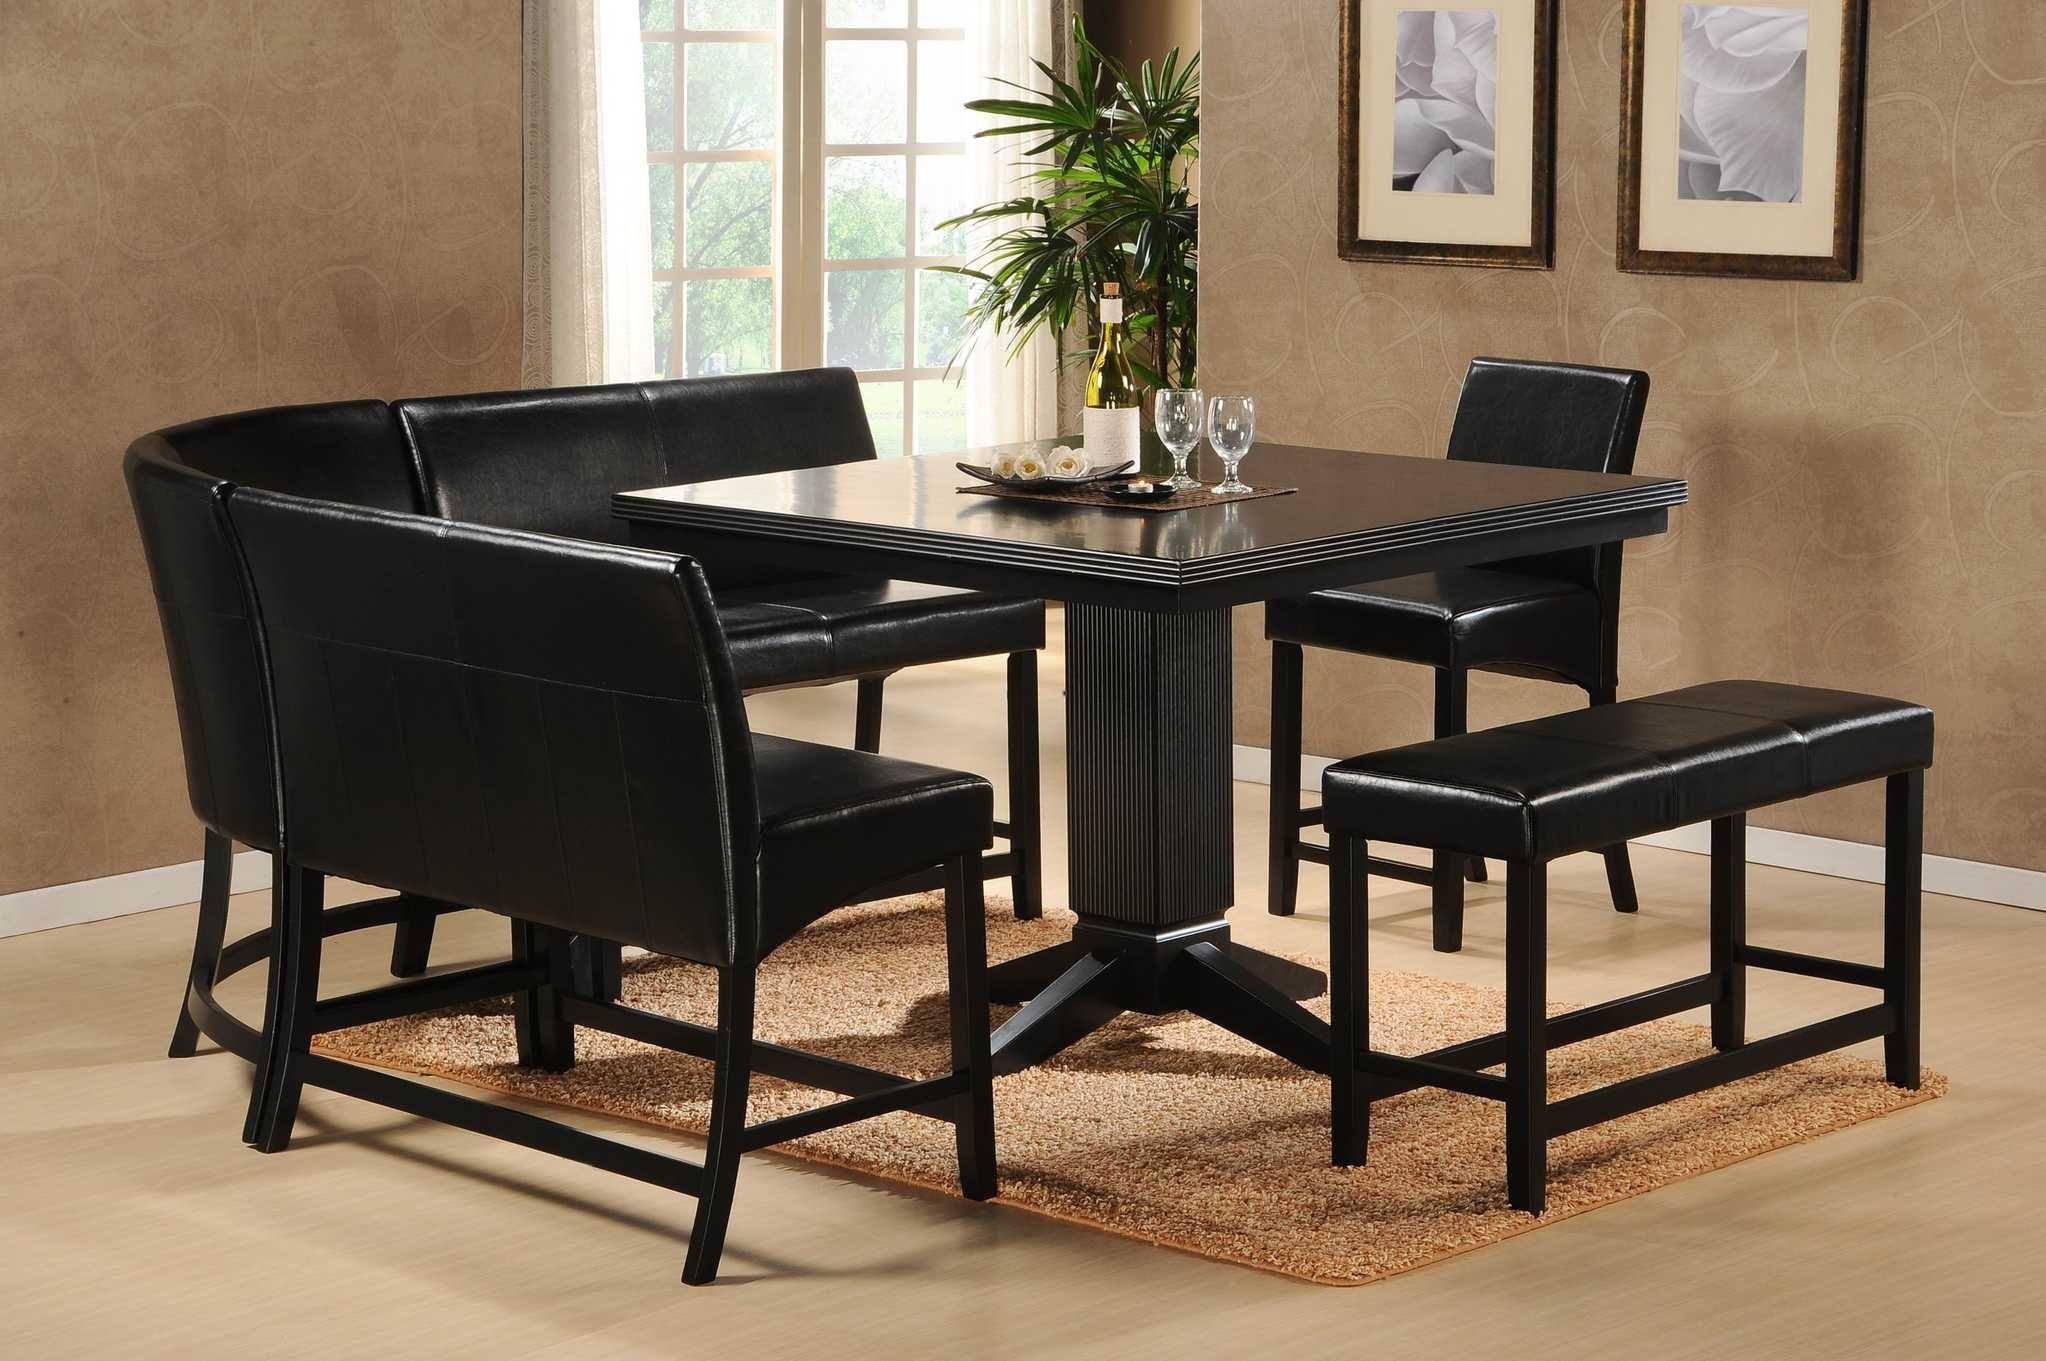 Dining Room Furniture Sets Cheap Mesmerizing Dining Room Furniture Sets Cheap  Modern Contemporary Furniture 2018